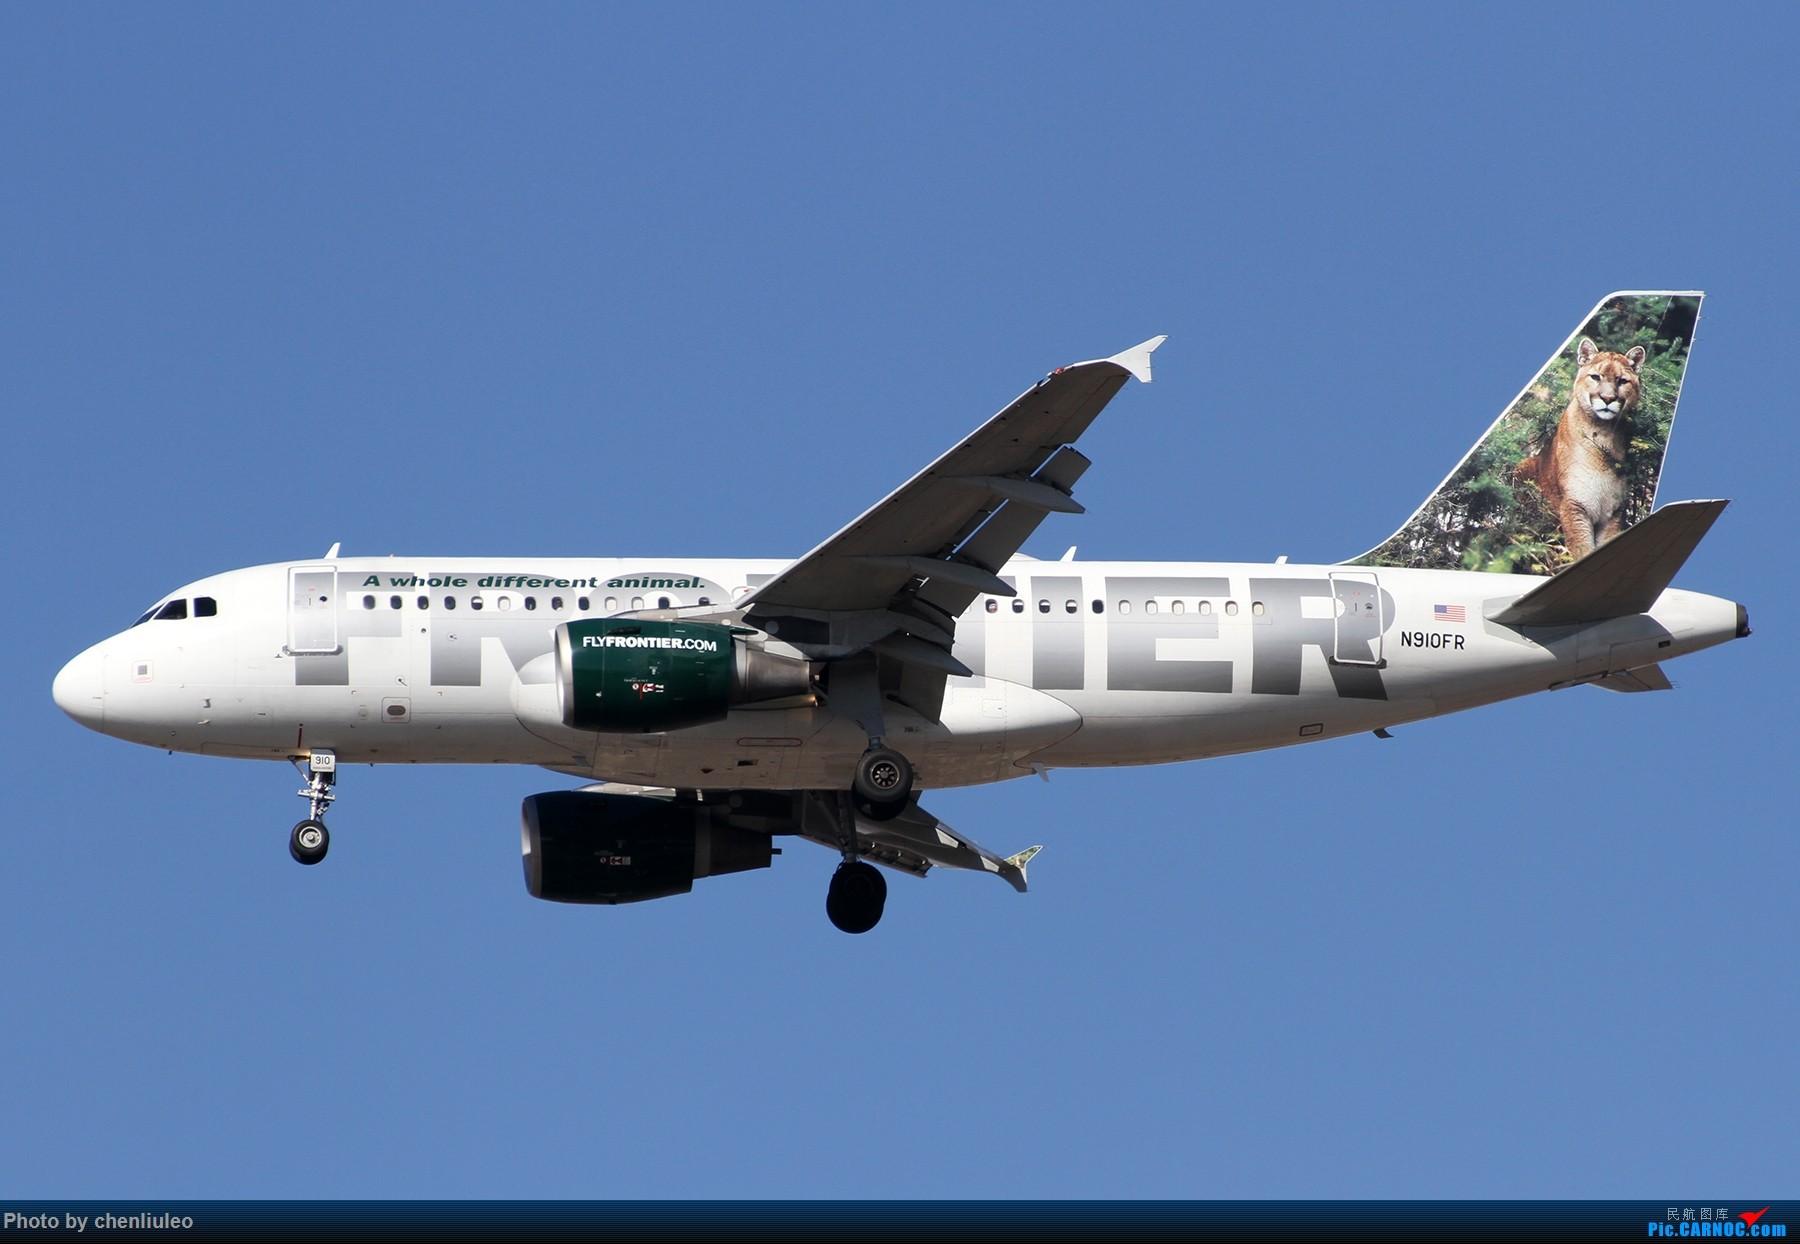 Re:[原创]【杭州飞友会】KSTL拍机。AA WN DL F9 BBJ 1800大图 AIRBUS A319-111 N910FR 美国圣路易斯机场